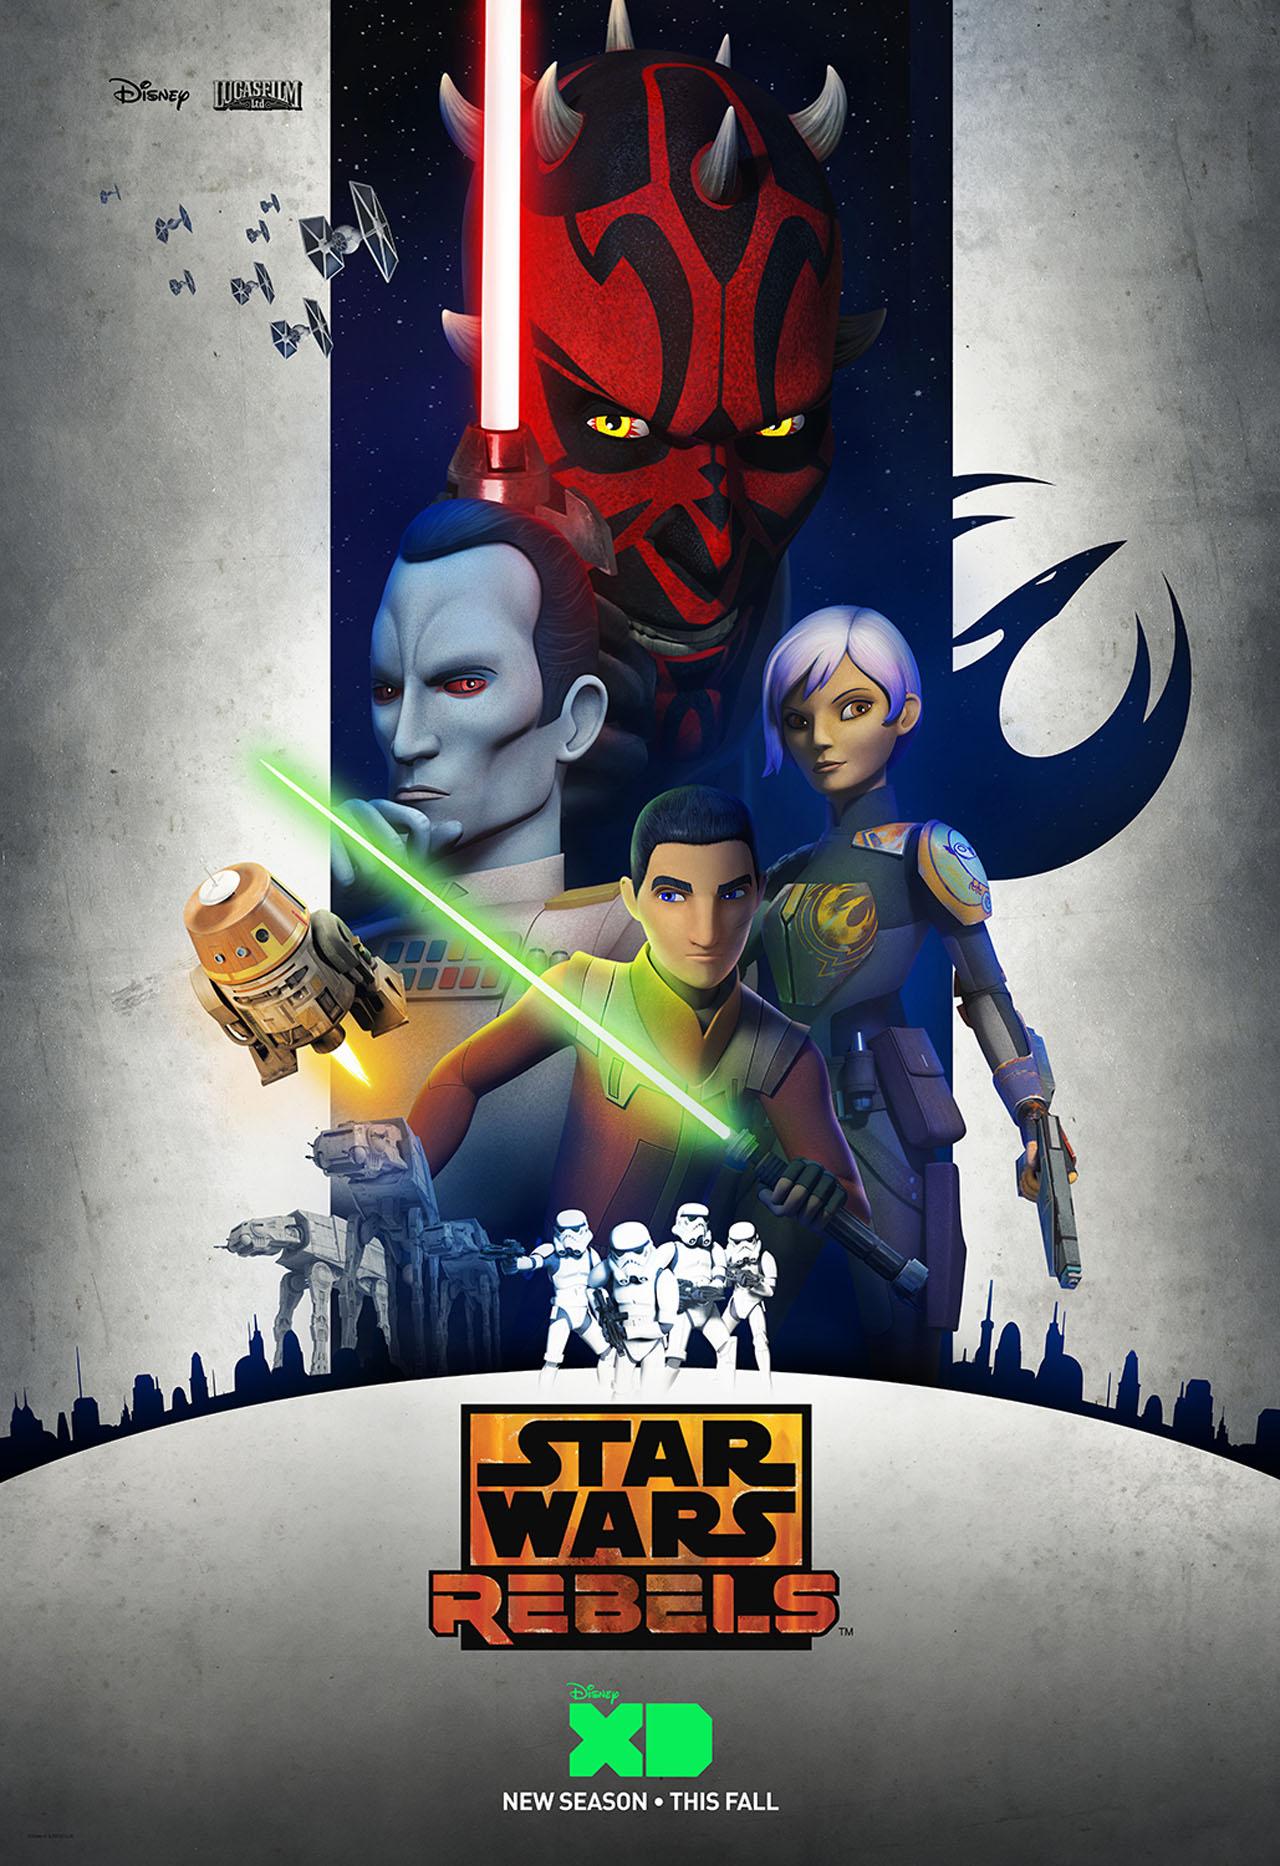 Star Wars Rebels Staffel 3 Trailer & Poster